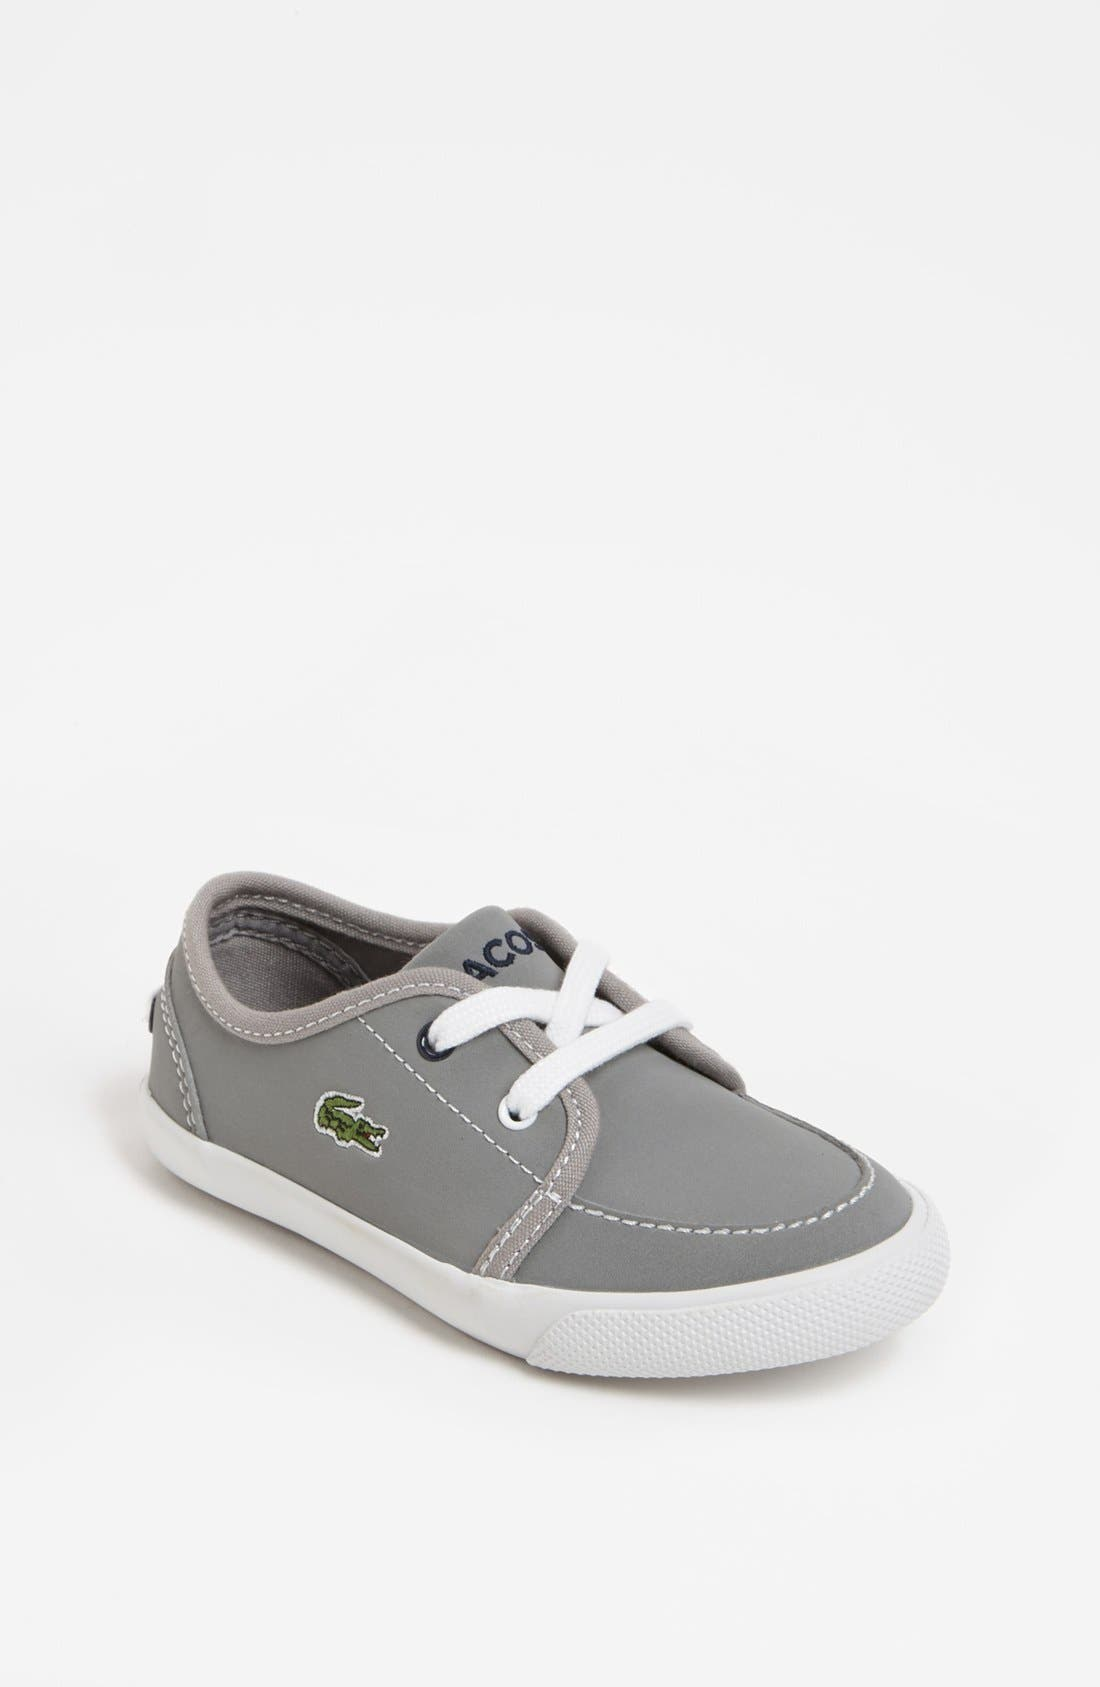 Main Image - Lacoste 'Boat DE' Sneaker (Toddler)